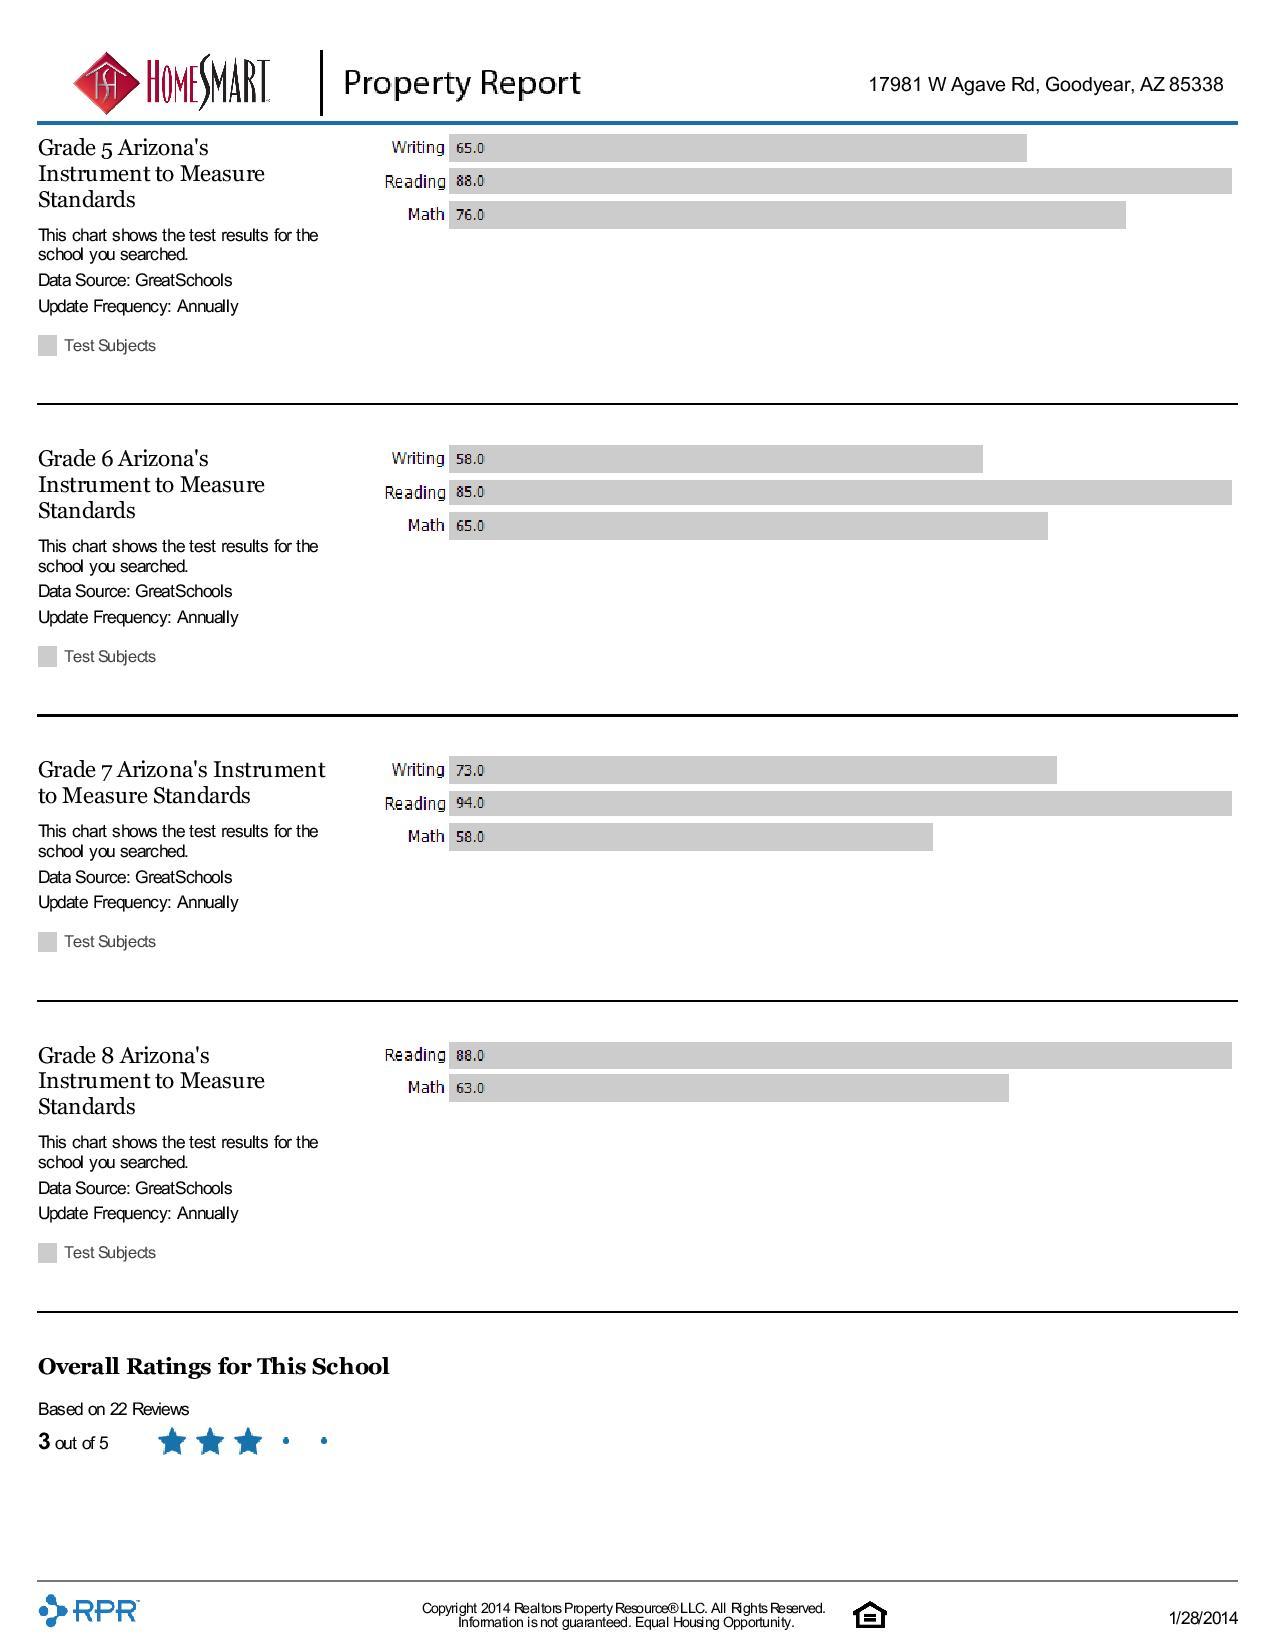 17981-W-Agave-Rd-Goodyear-AZ-85338.pdf-page-011